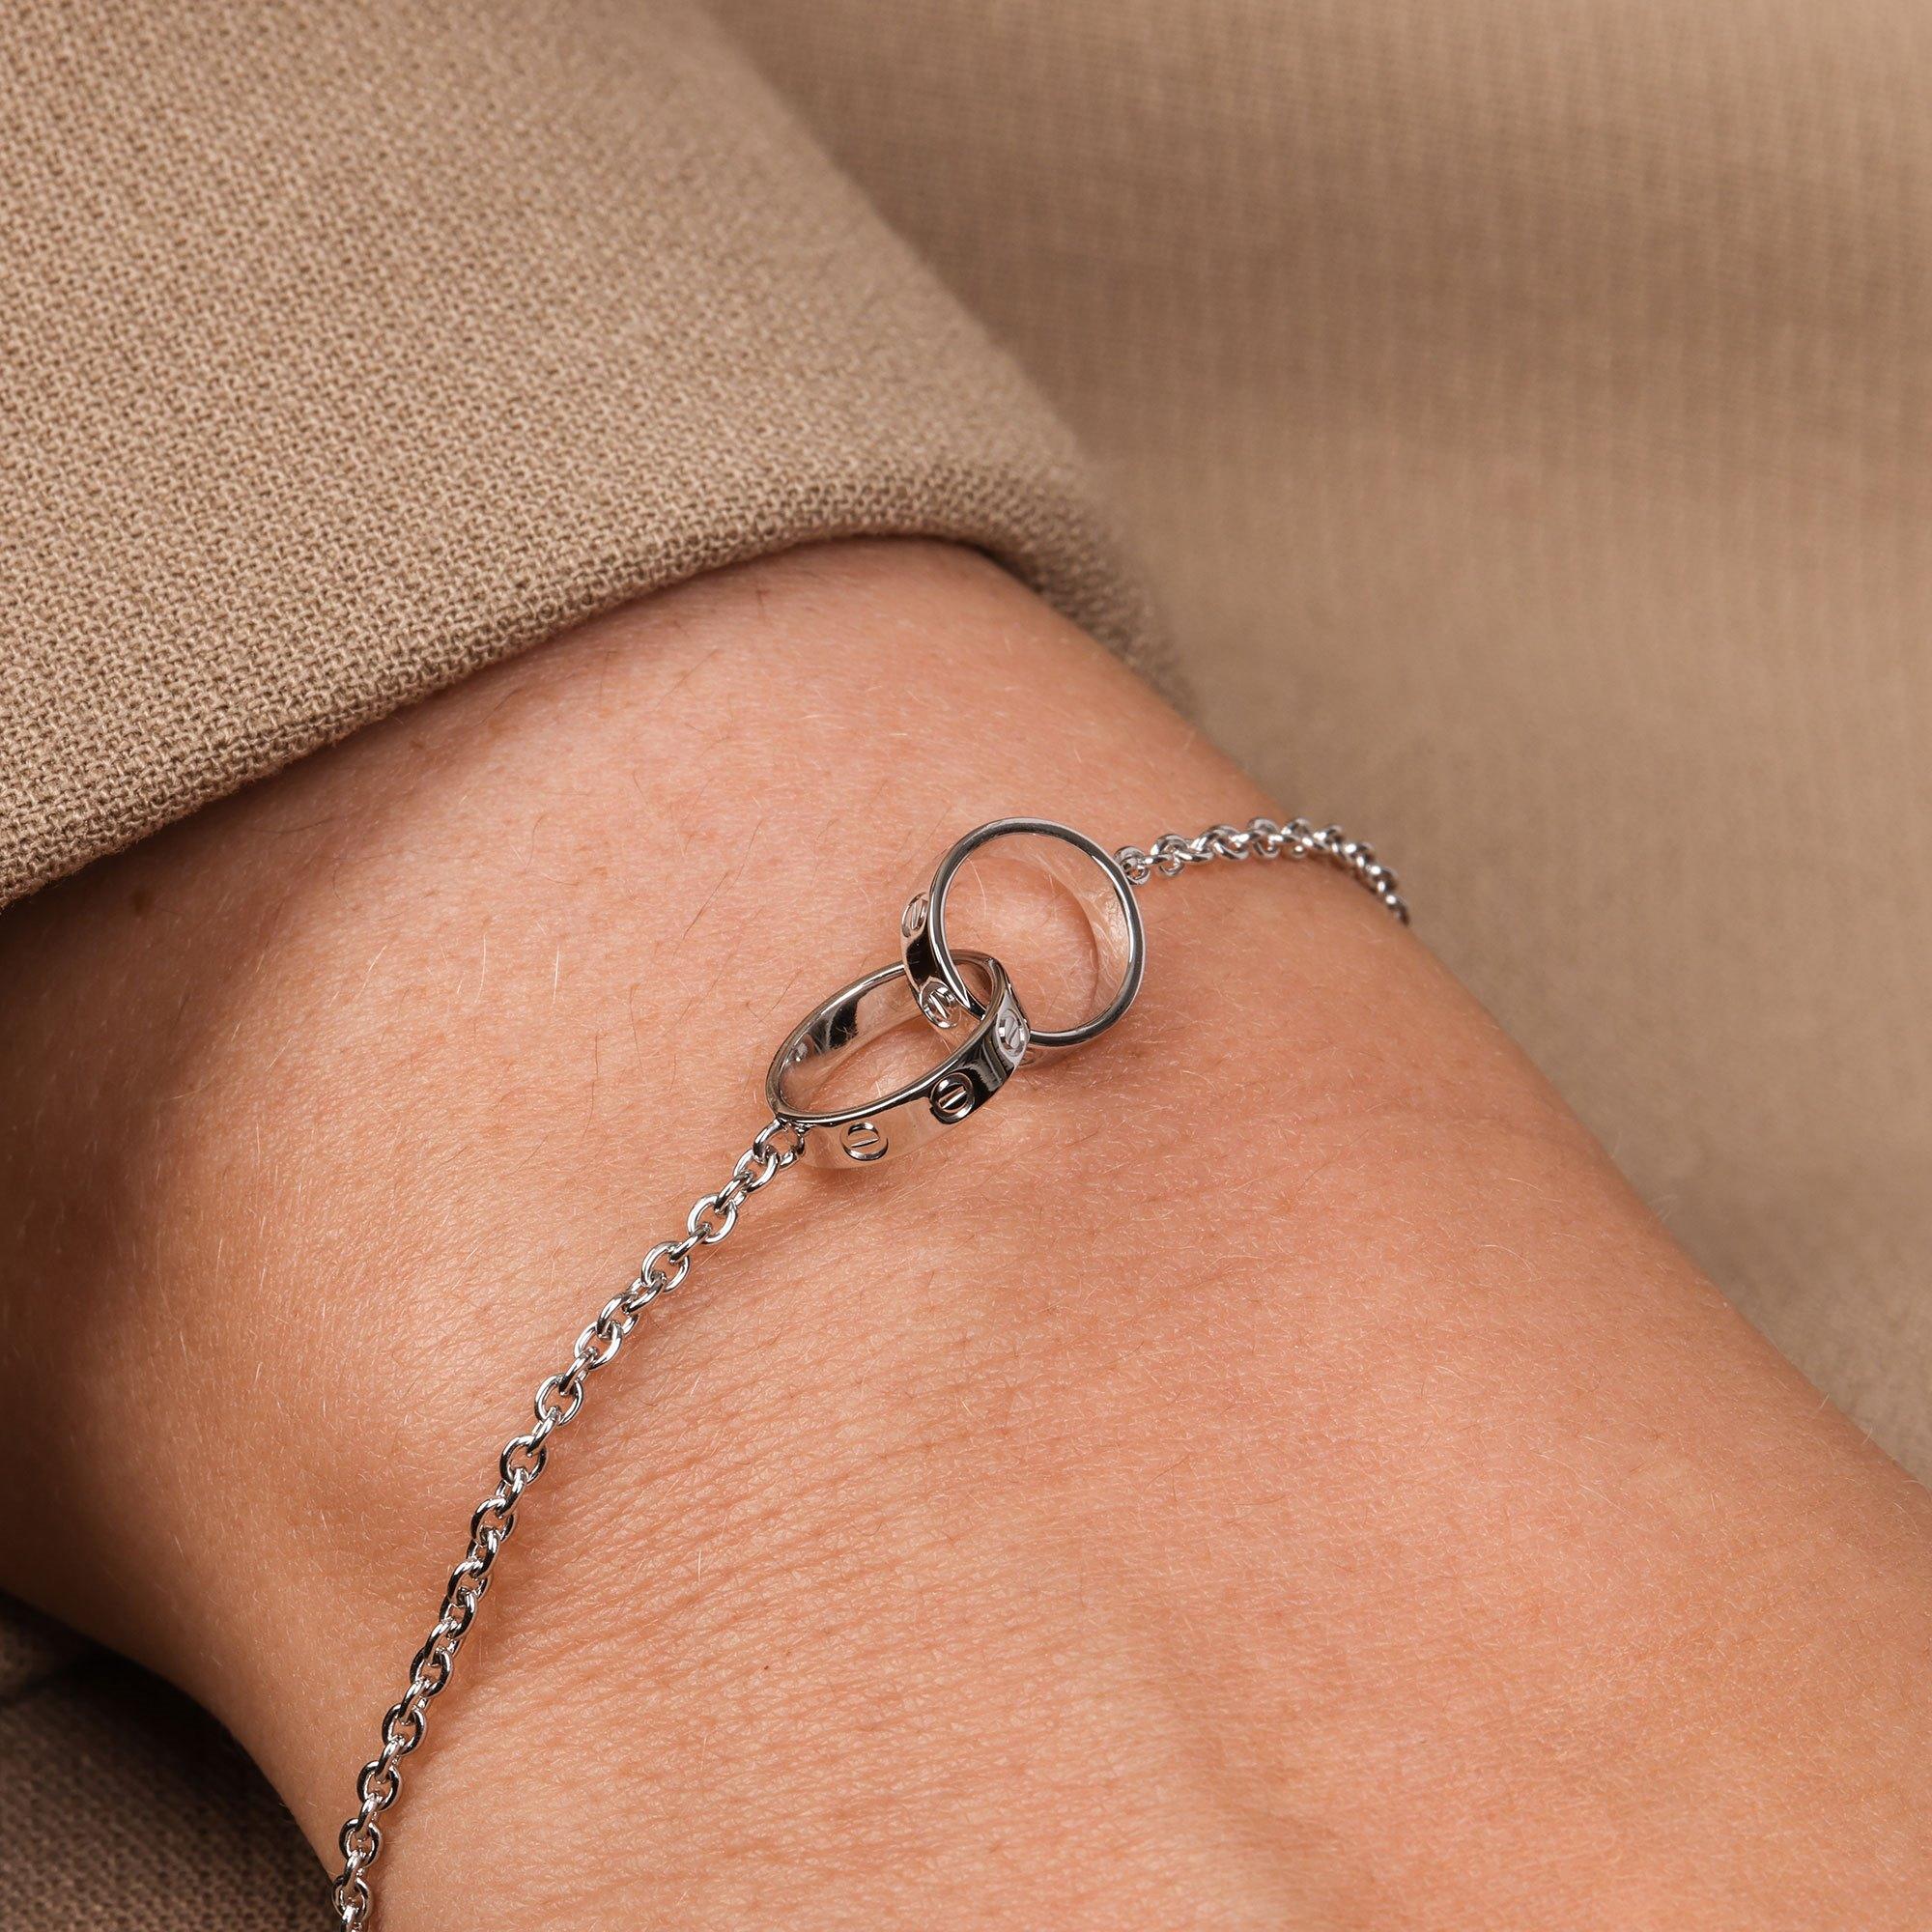 Cartier 18ct White Gold Bracelet